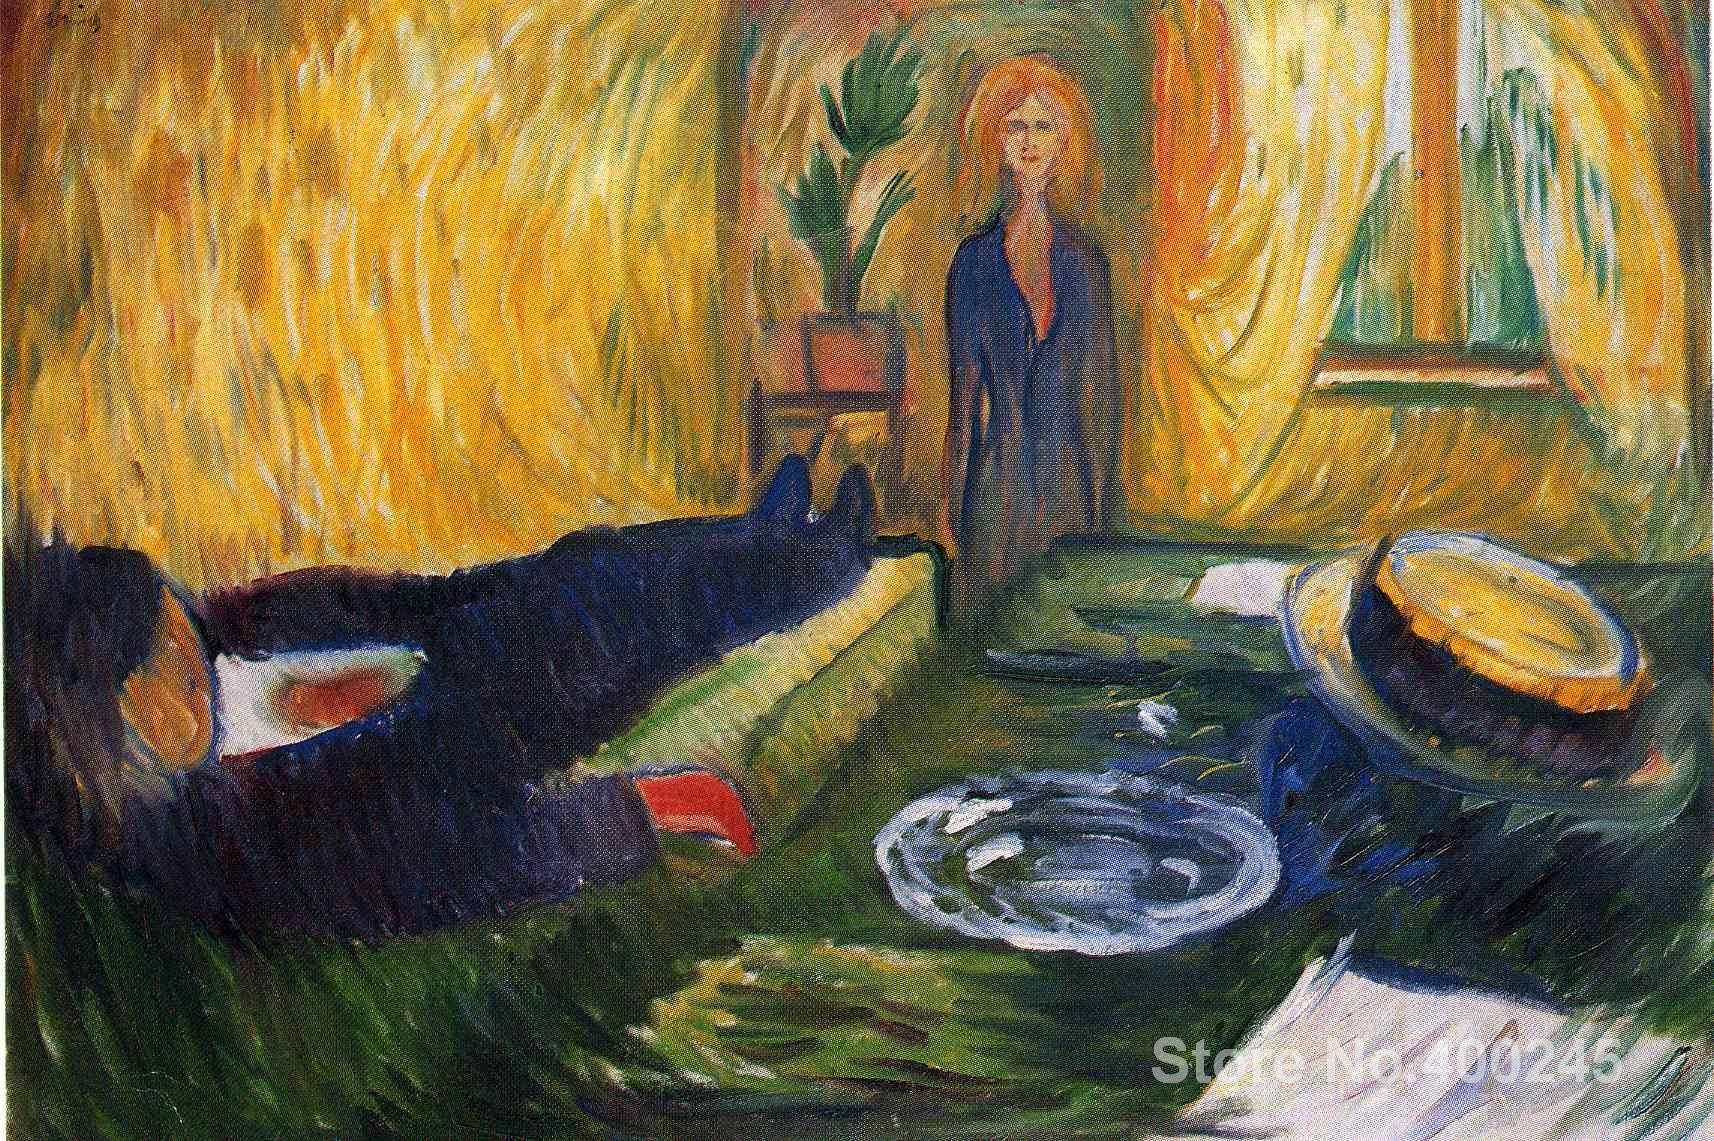 Pintura al óleo The Murderess de Edvard Munch hecha a mano de alta calidad